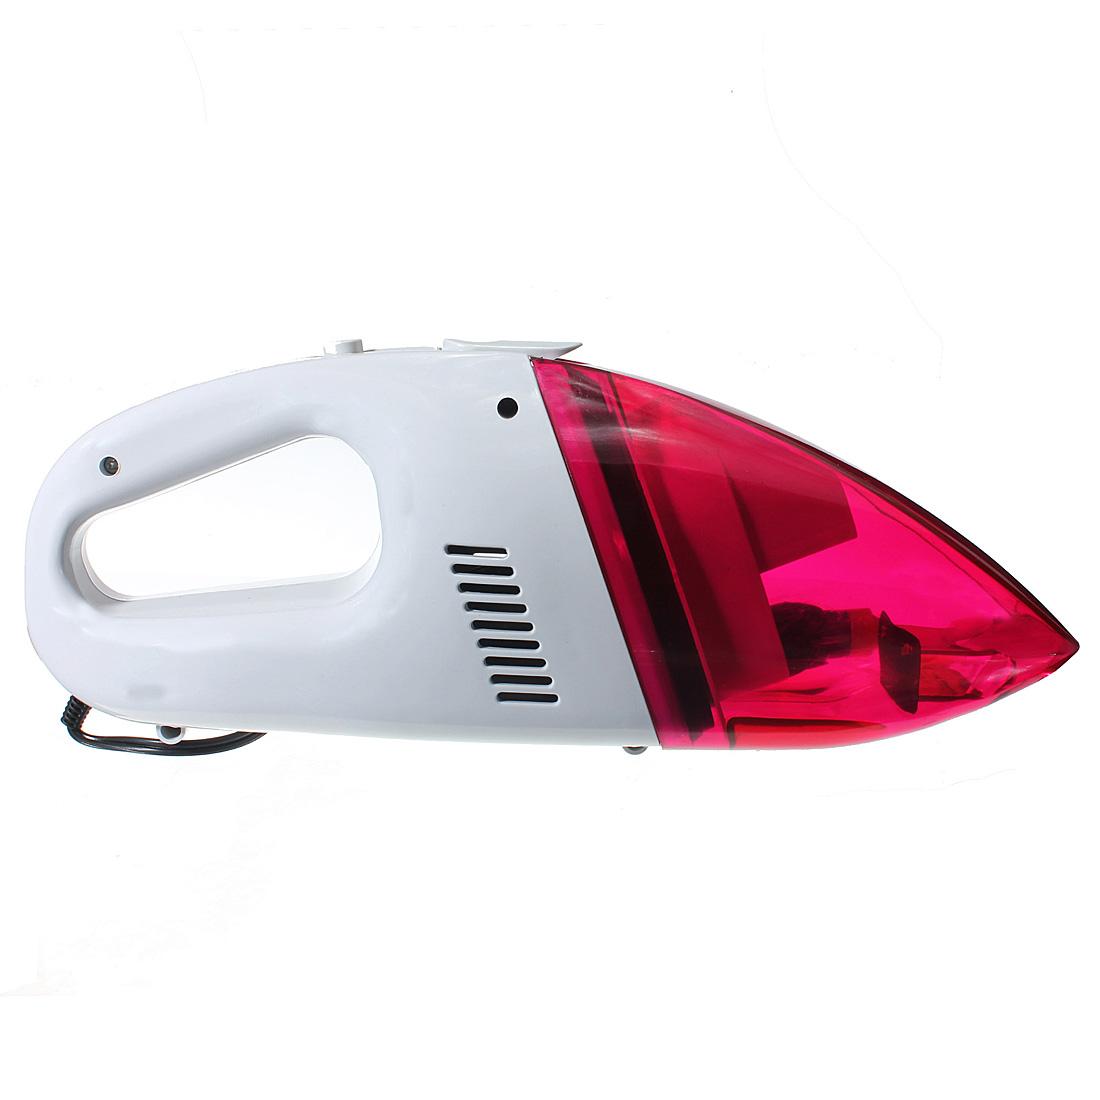 Tempsa 12v mini aspirateur main portable auto voiture - Aspirateur portable pour voiture ...